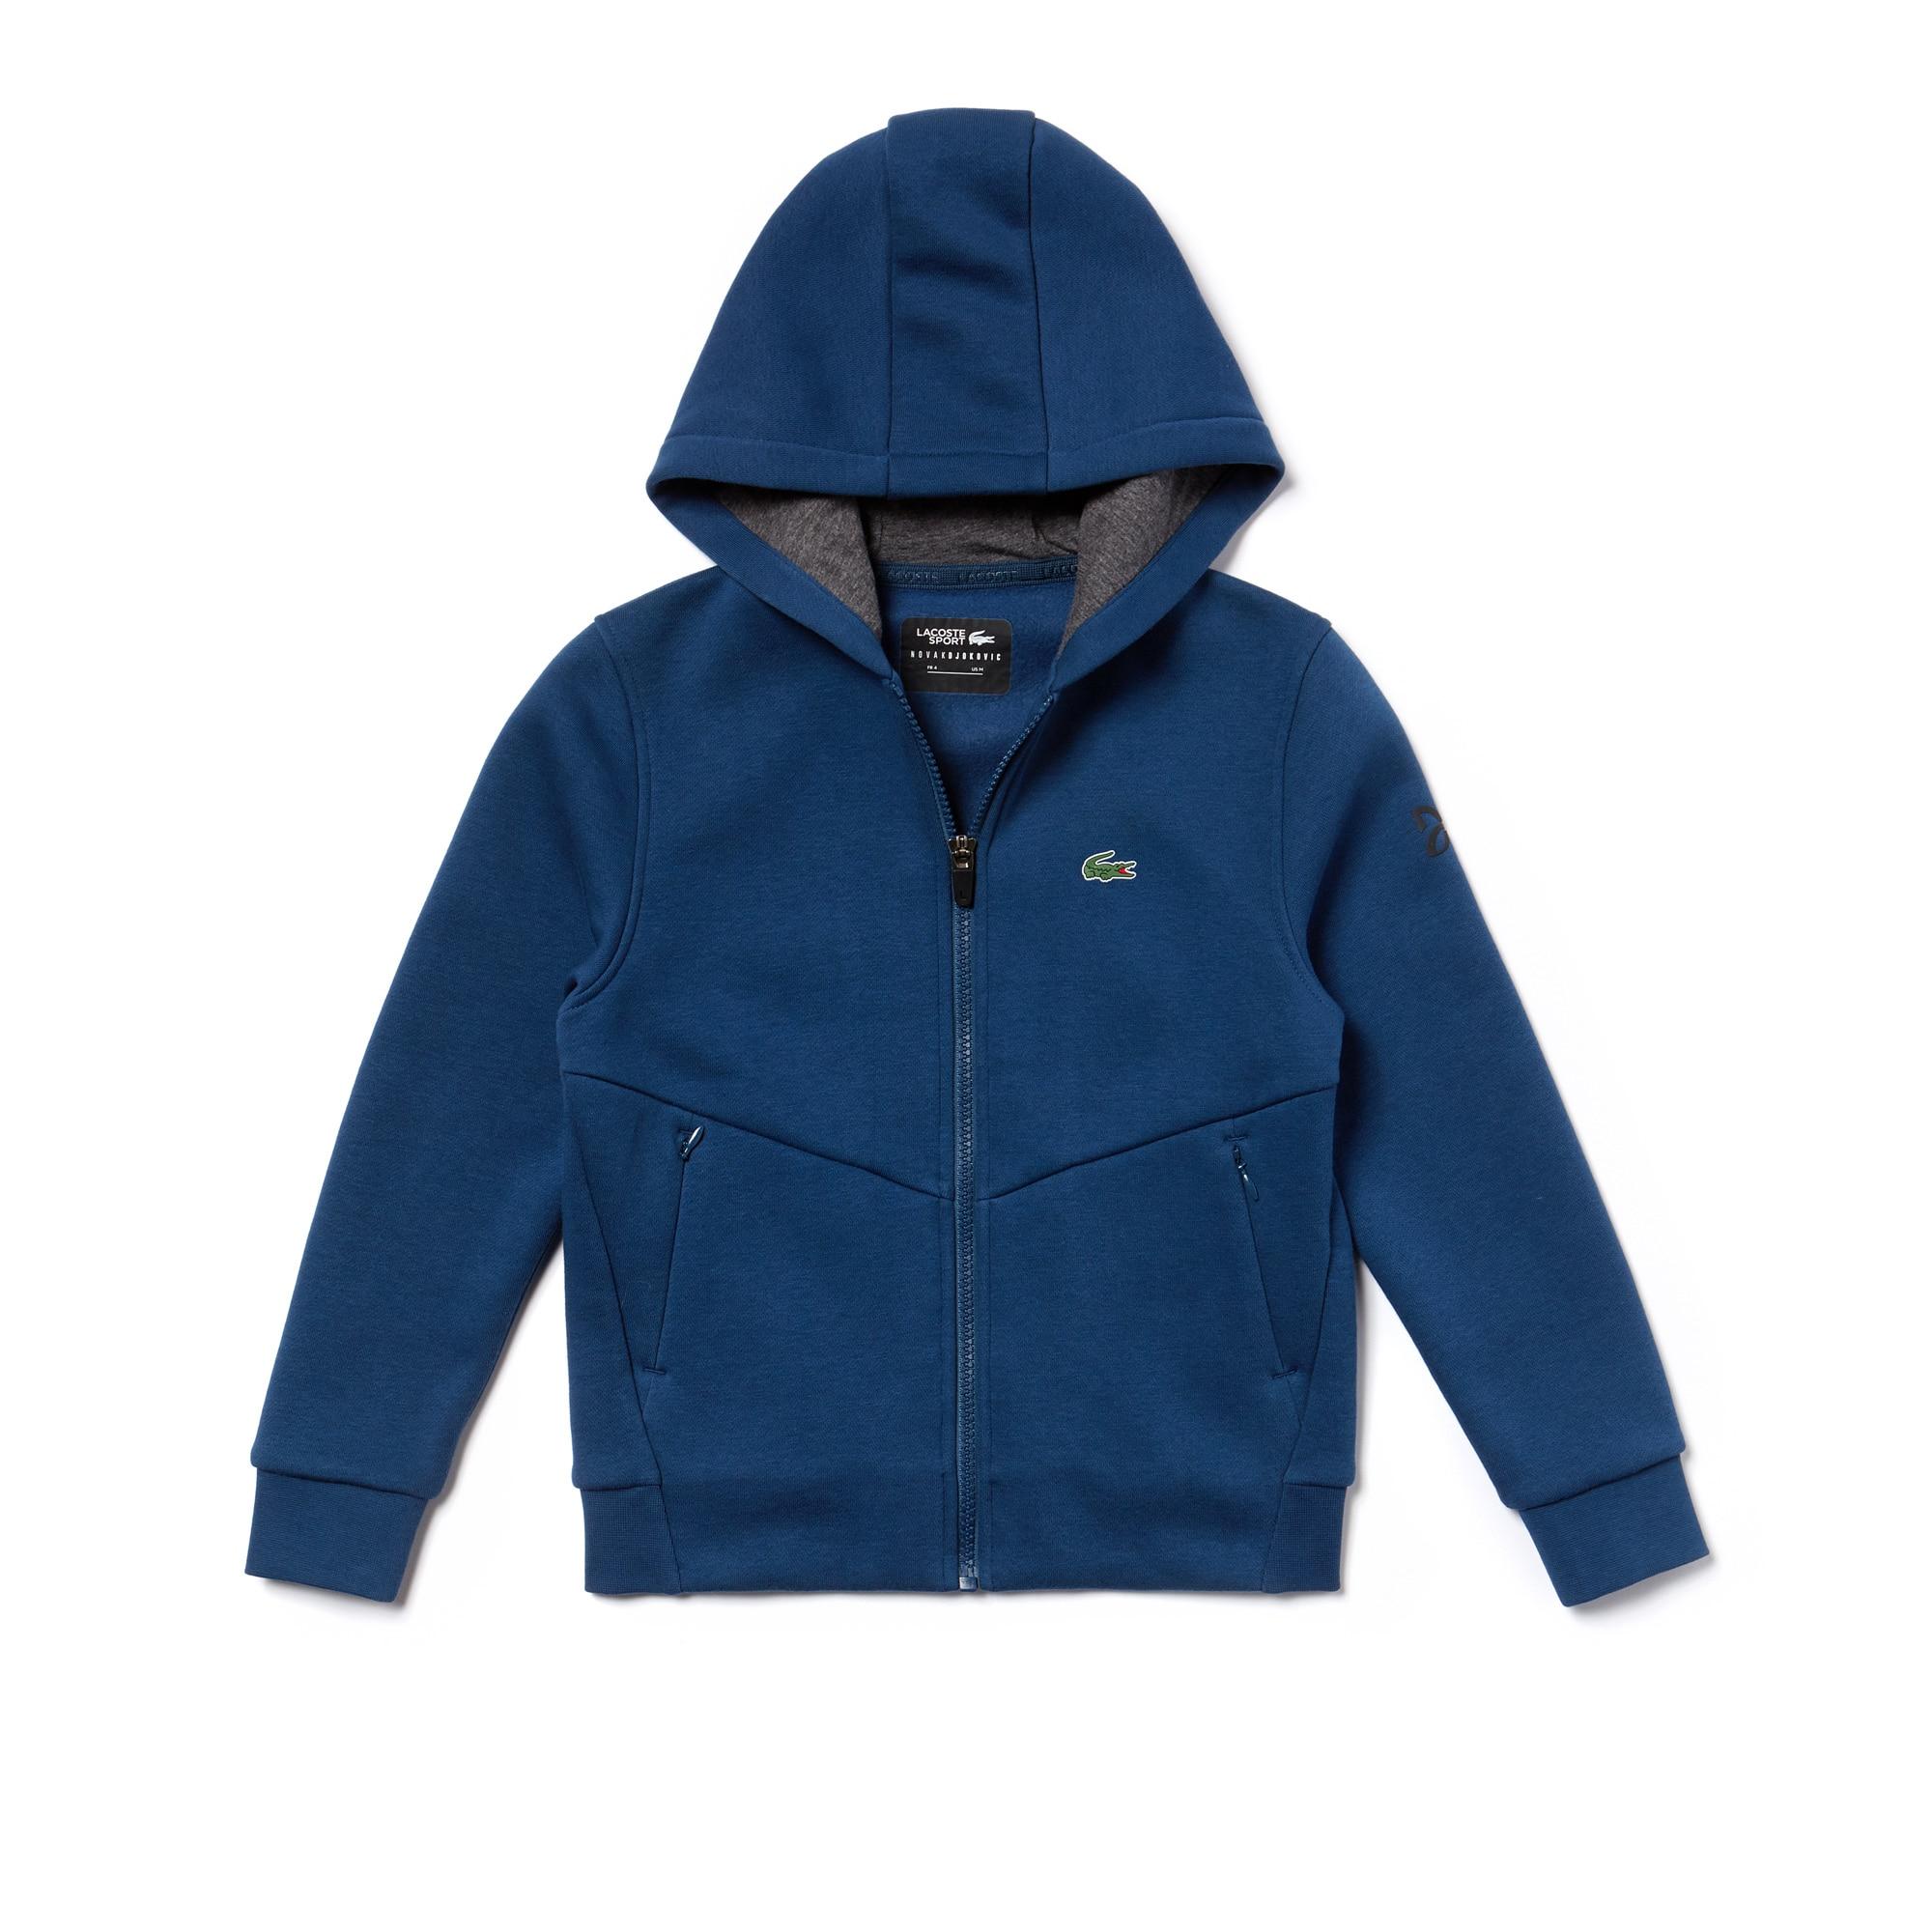 Sweatshirt zippé Garçon Lacoste SPORT Collection Novak Djokovic - Off Court en molleton technique